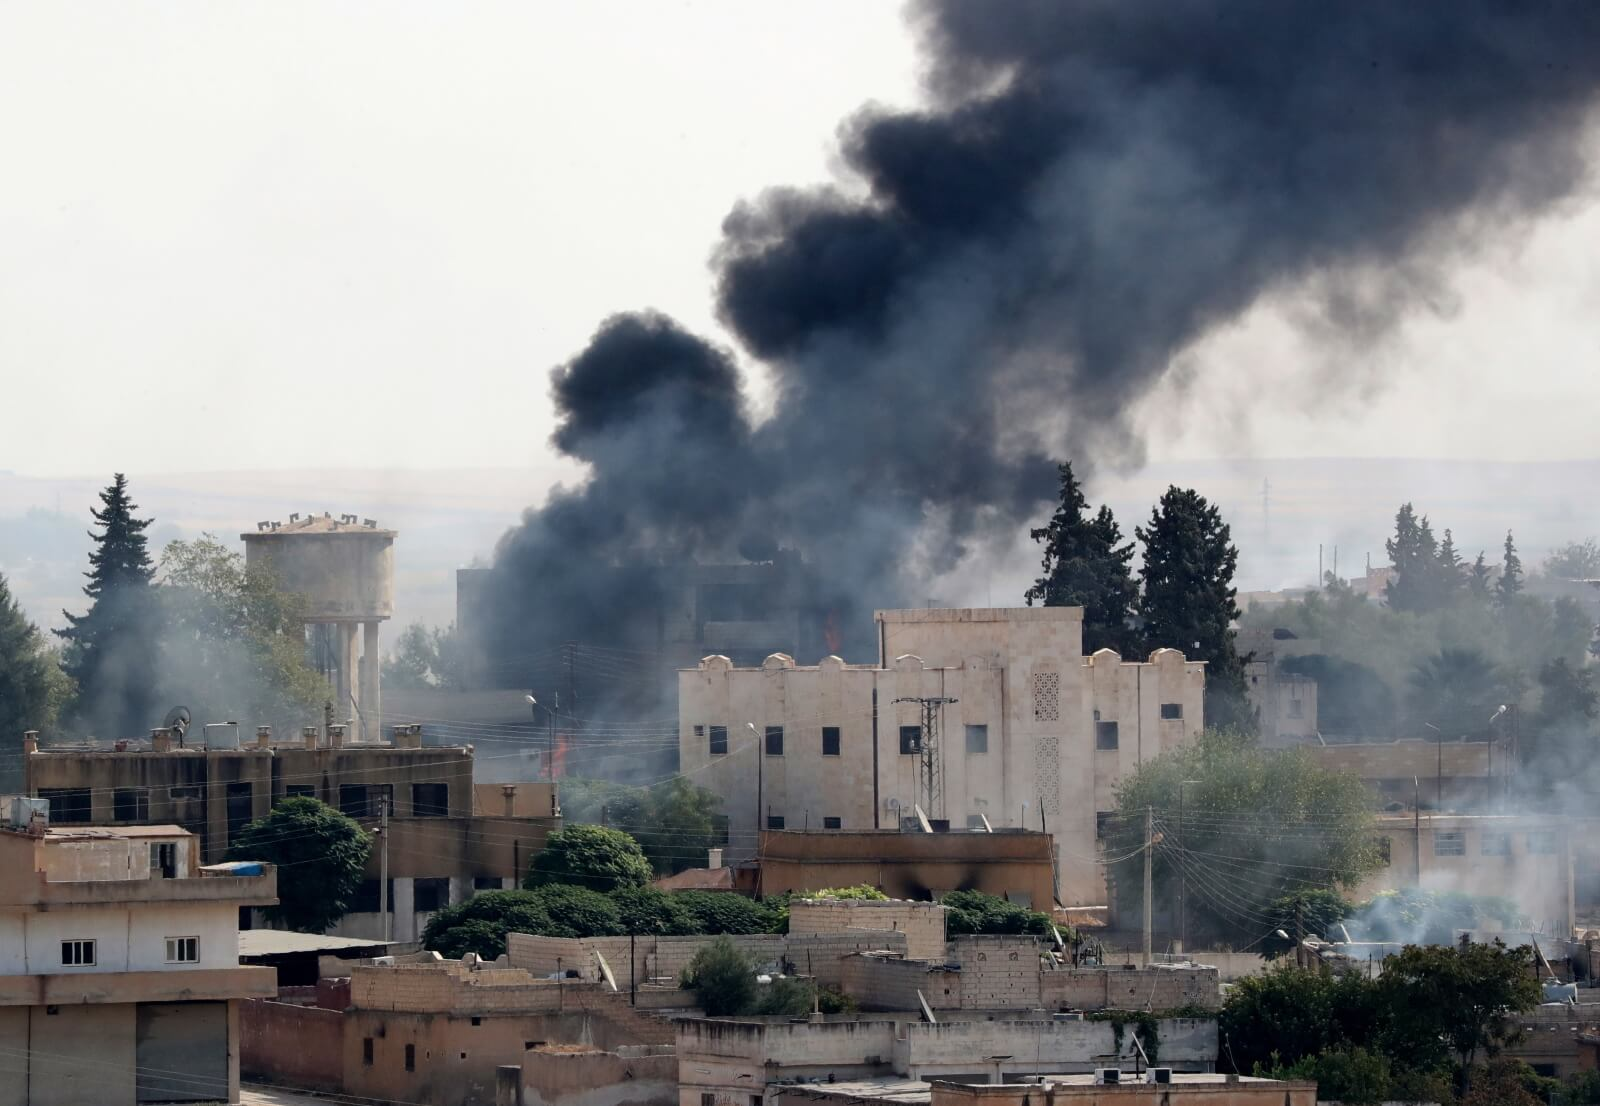 Turecka operacja w Syrii fot. EPA/ERDEM SAHIN